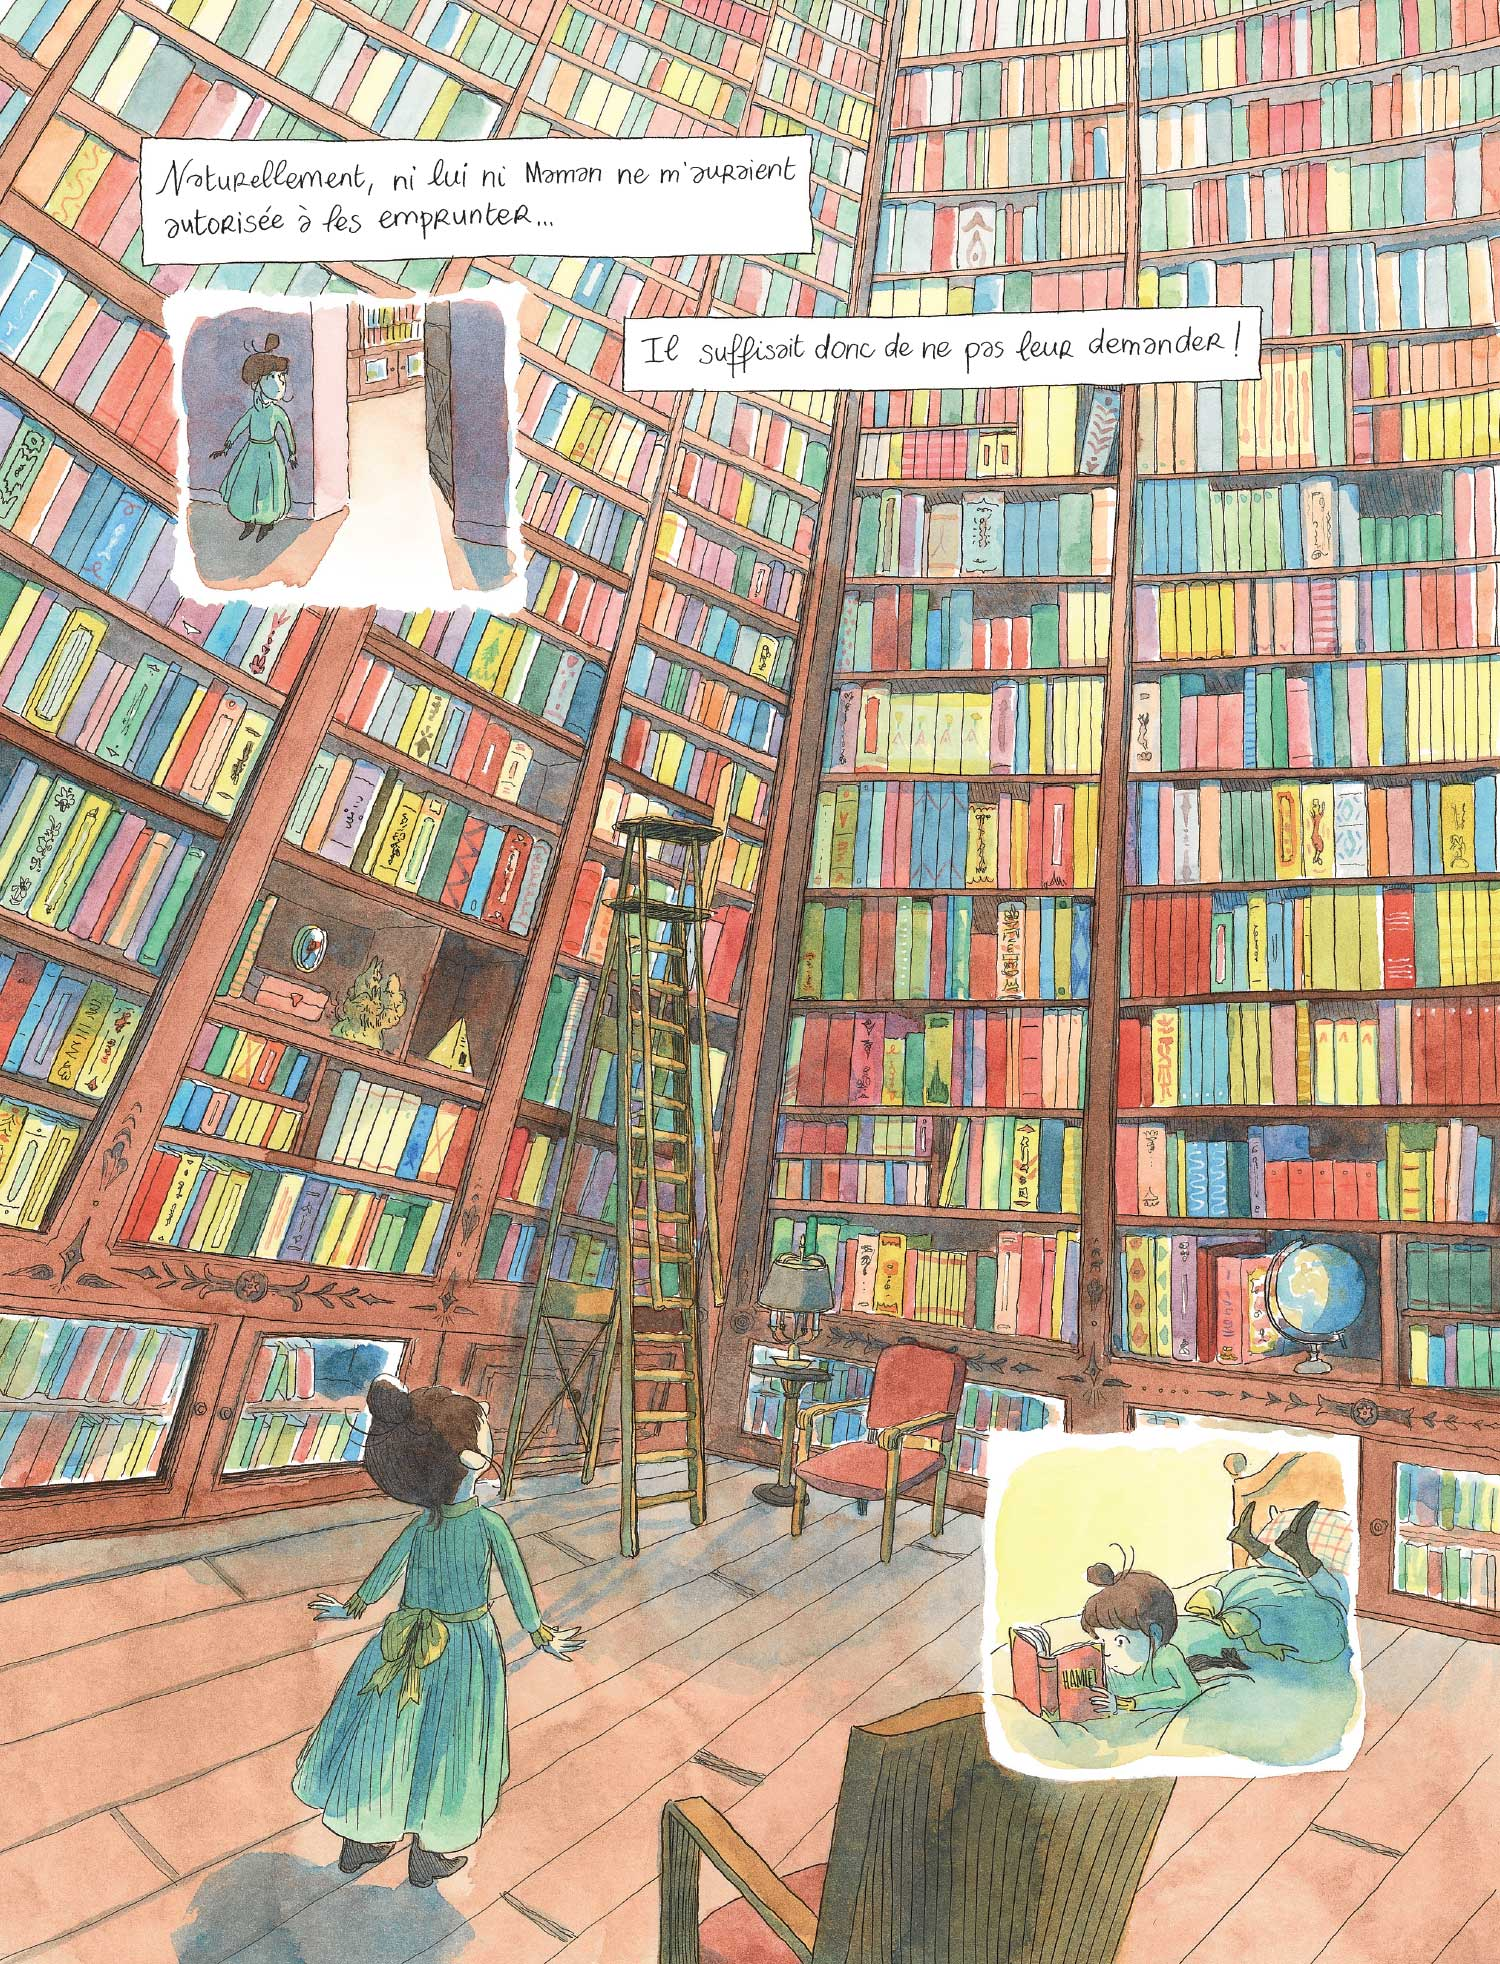 La bibliothèque de papa